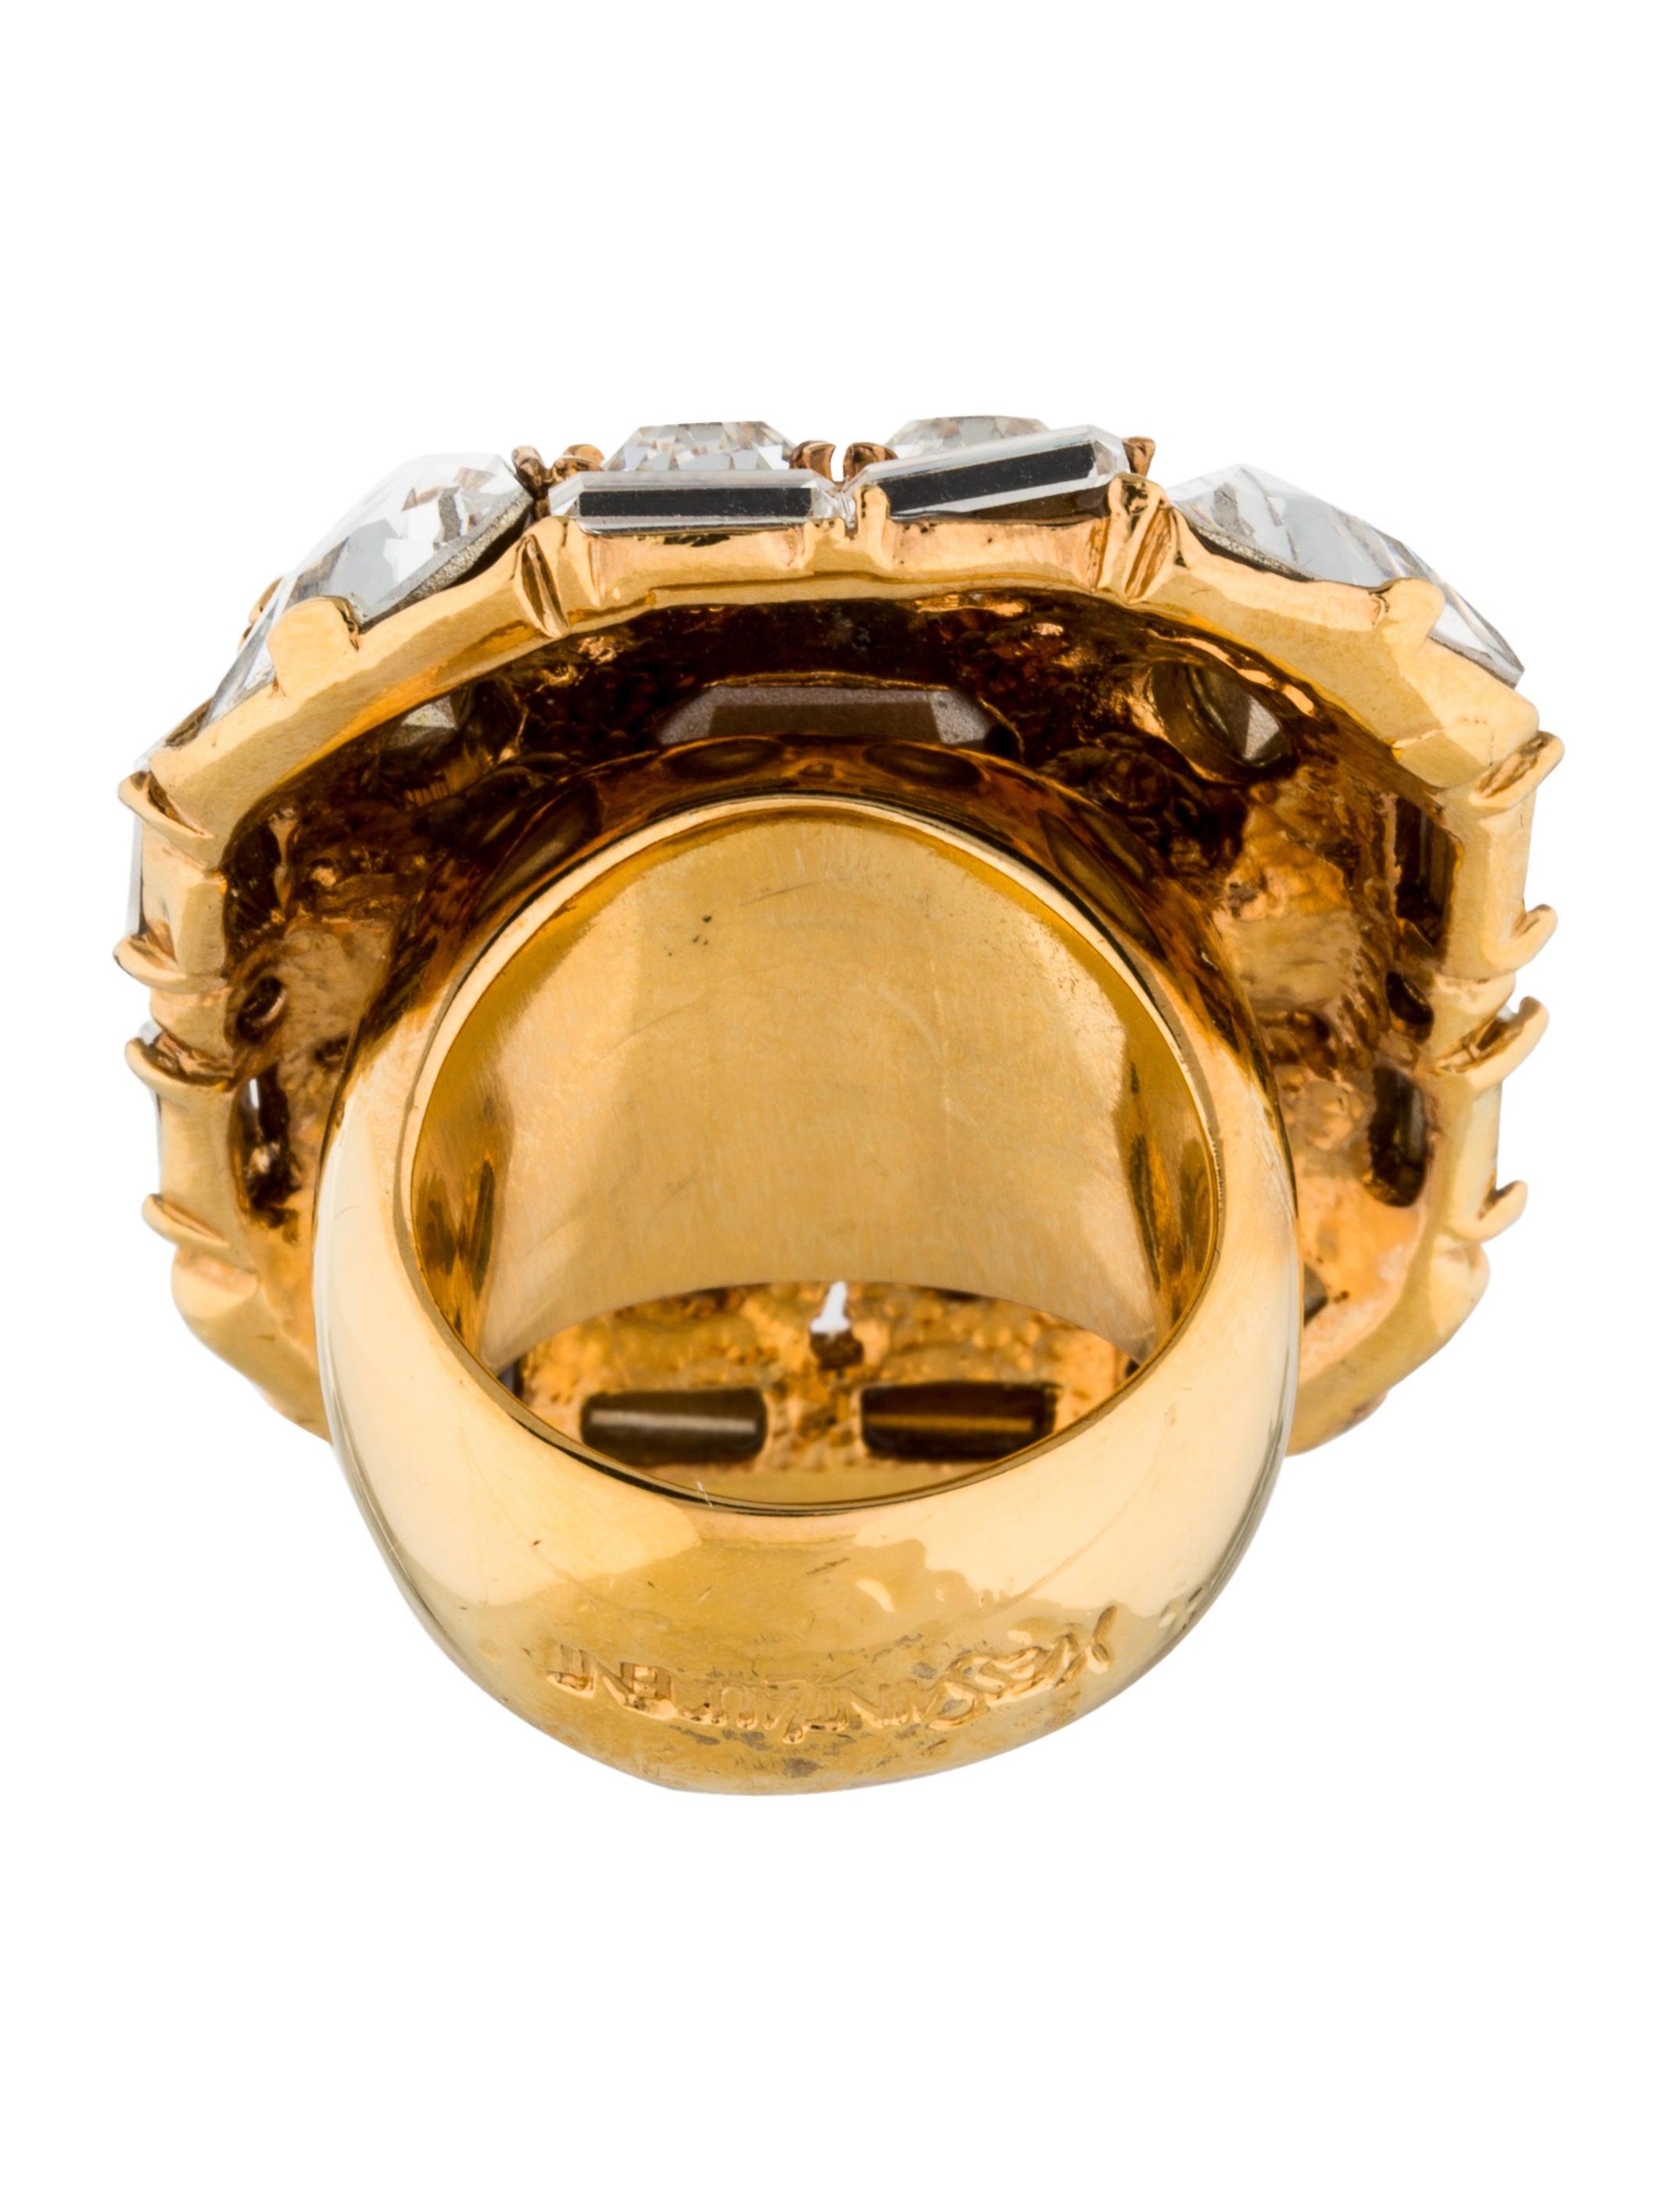 yves saint laurent crystal cocktail ring rings. Black Bedroom Furniture Sets. Home Design Ideas